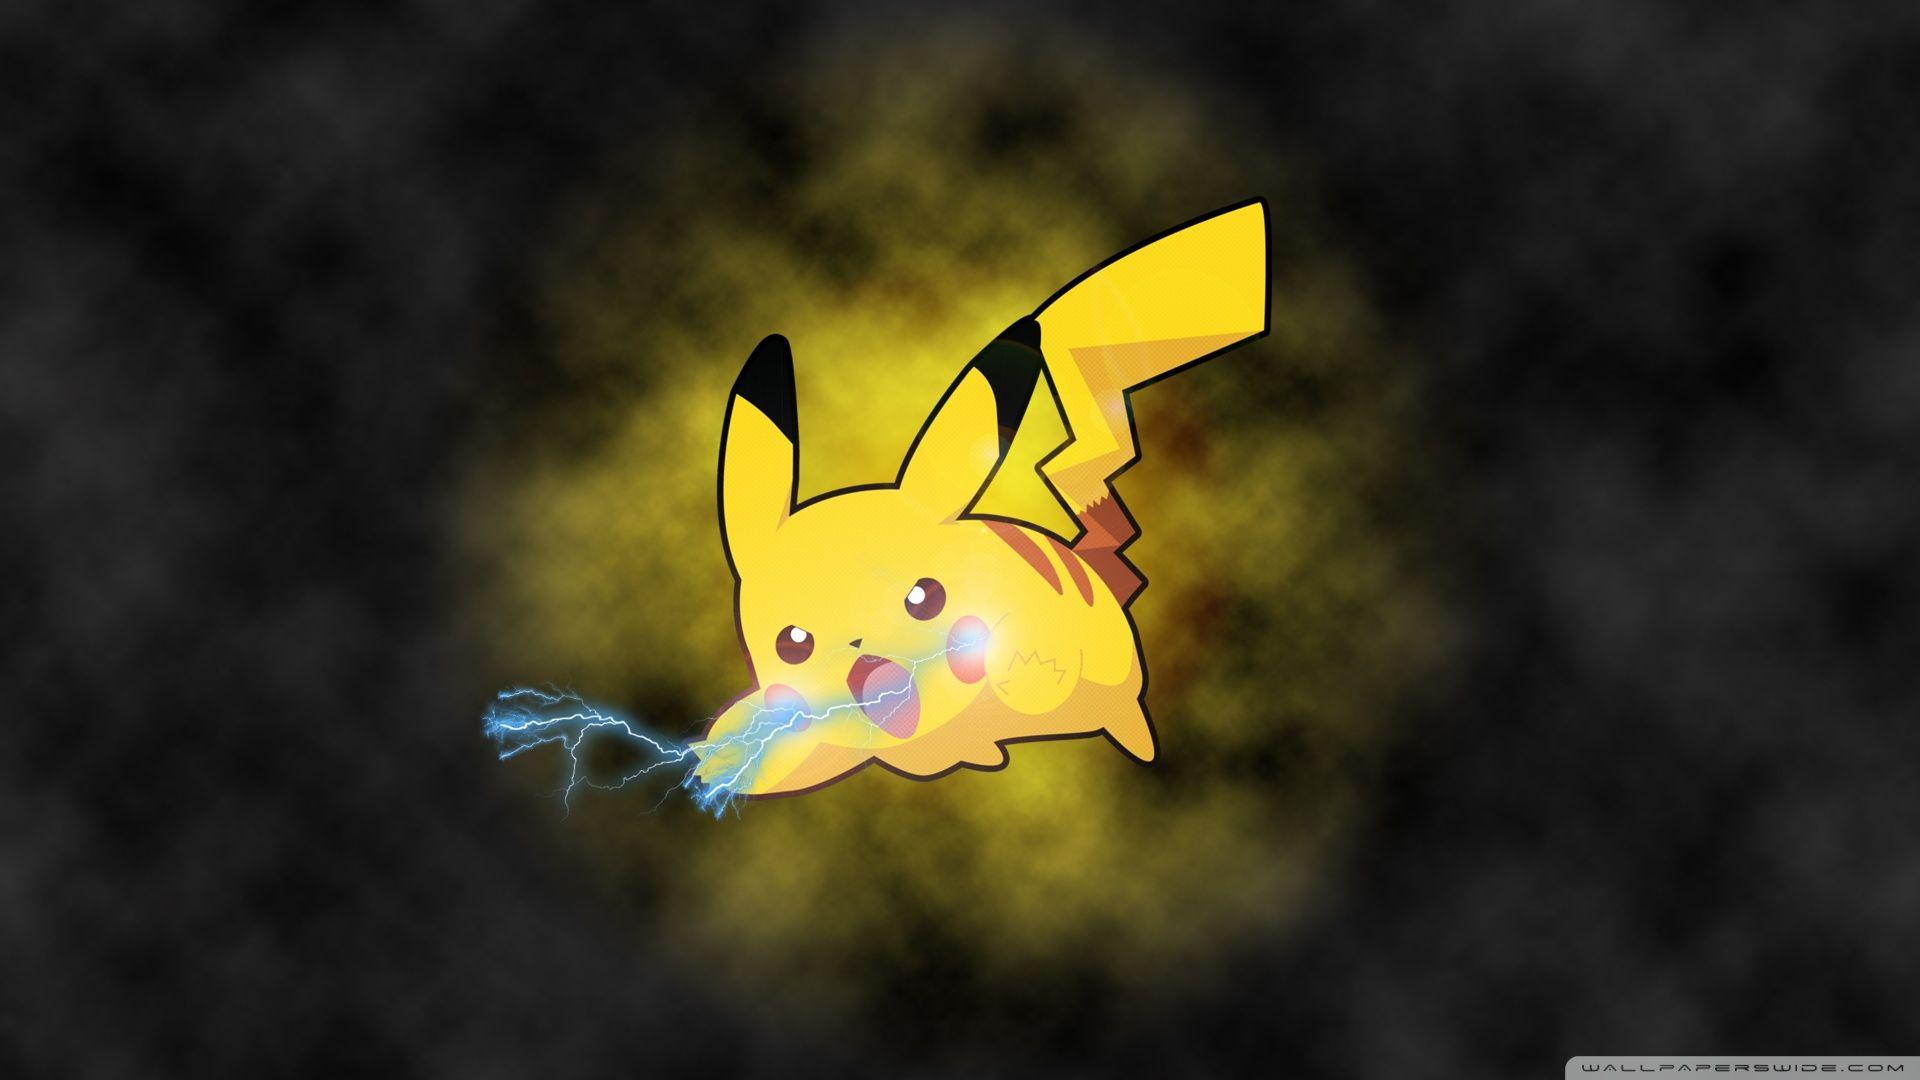 Pikachu HD Wallpapers - Wallpaper Cave